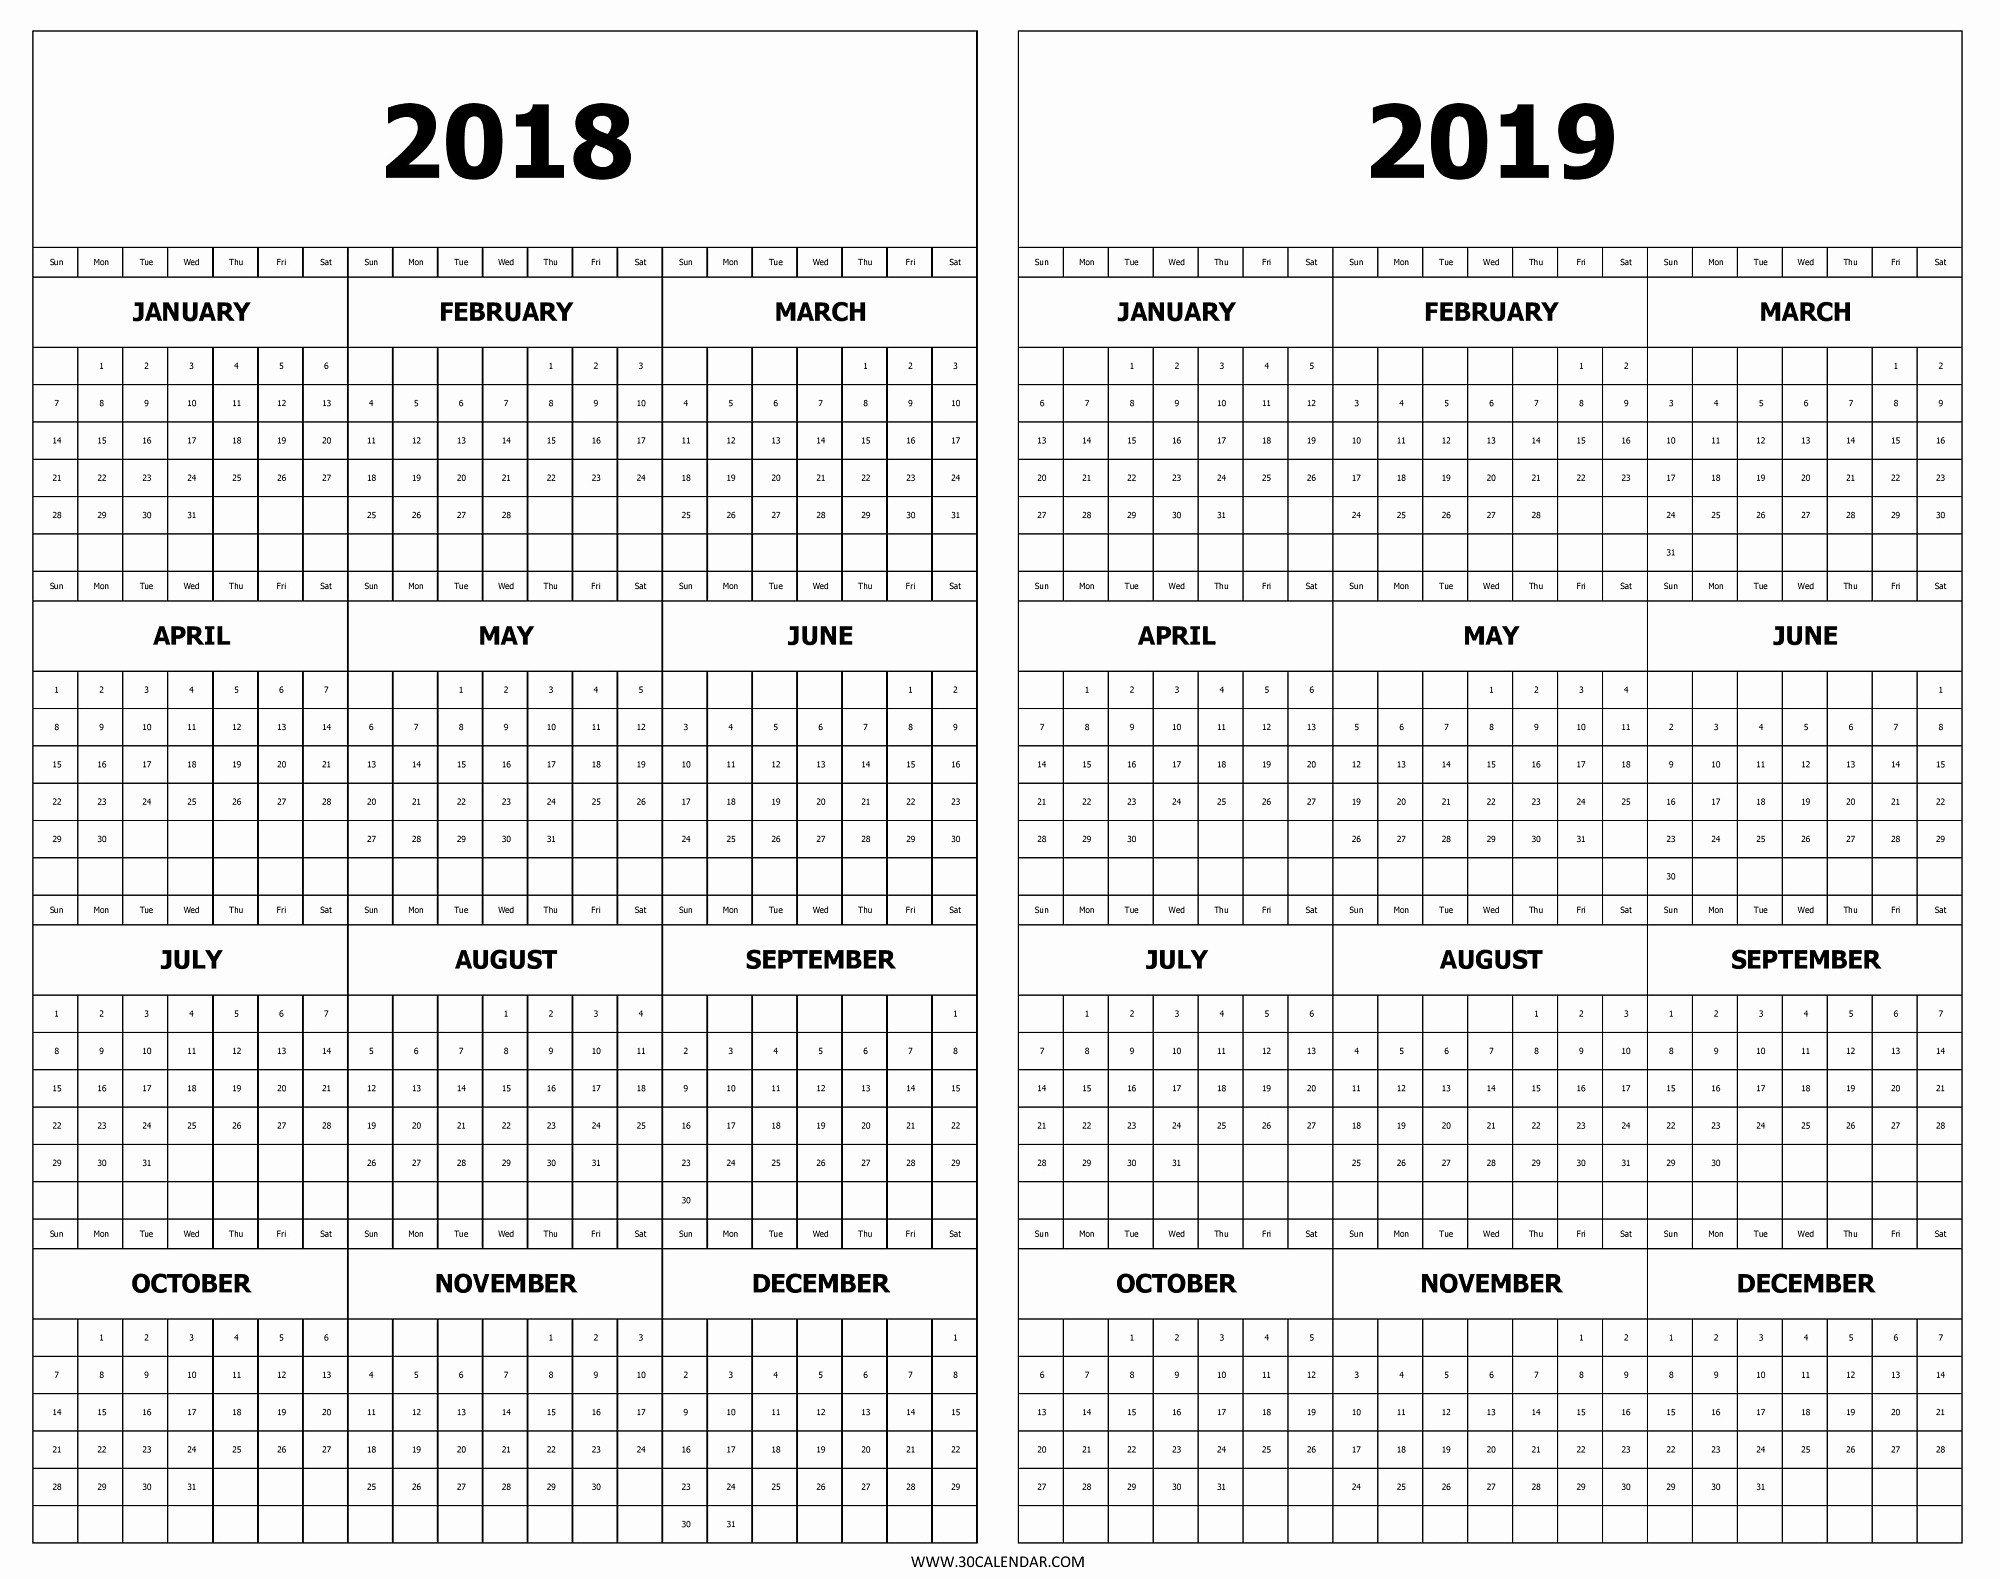 2 Year Calendar On One Page | Ten Free Printable Calendar 2020-2021 inside Yrdsb Calendar 2019 2021